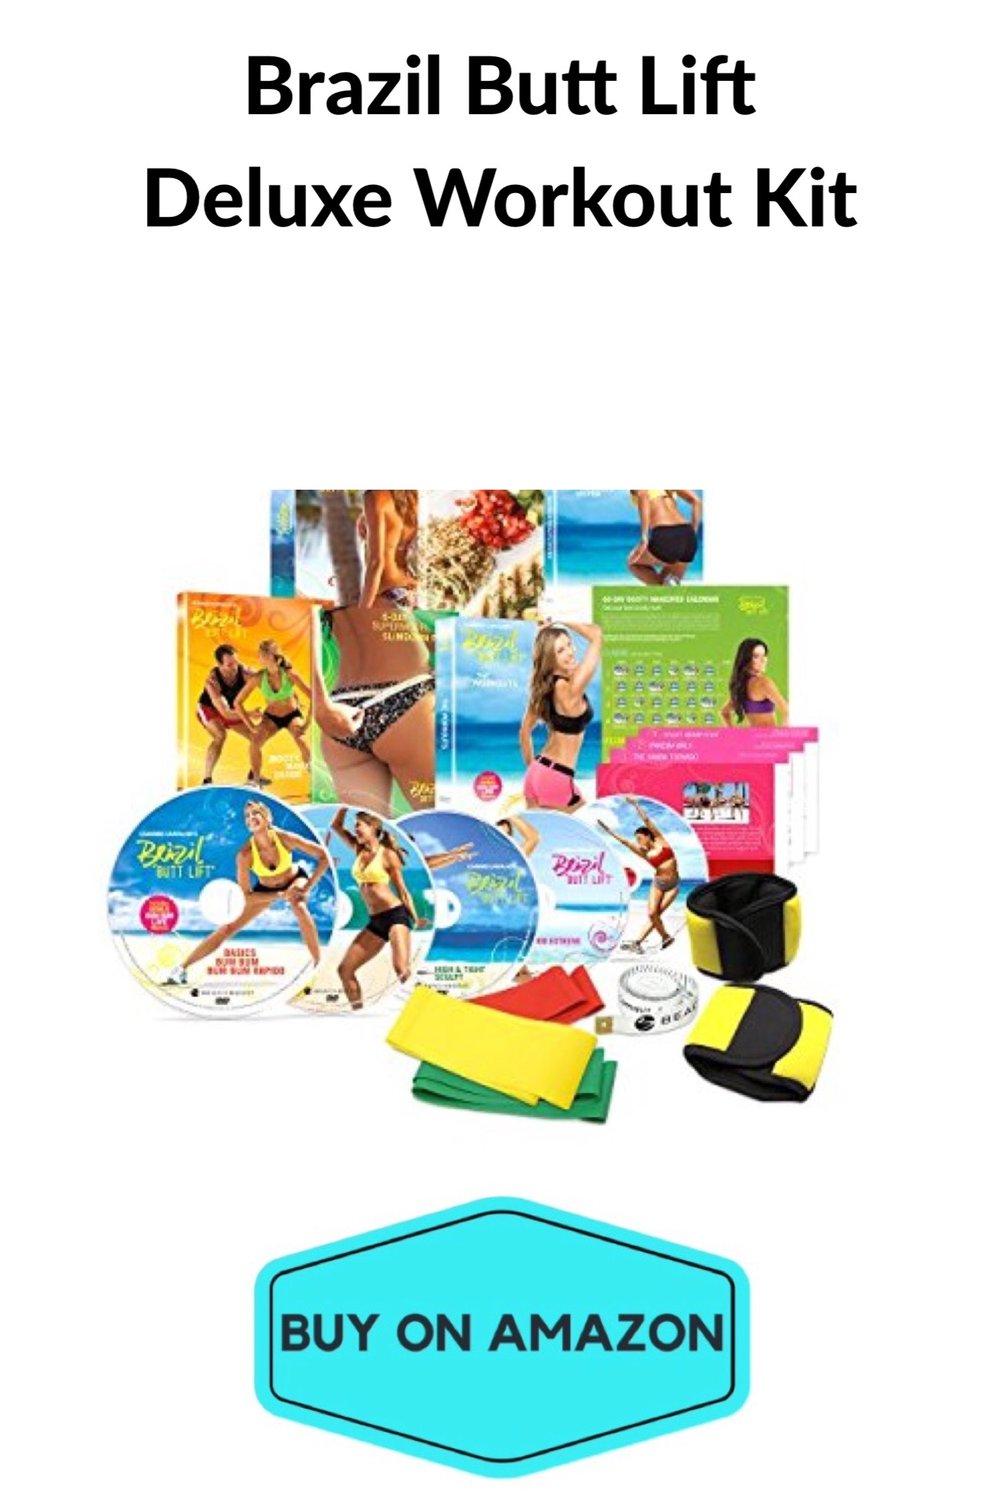 Brazil Butt Lift Deluxe Workout Kit